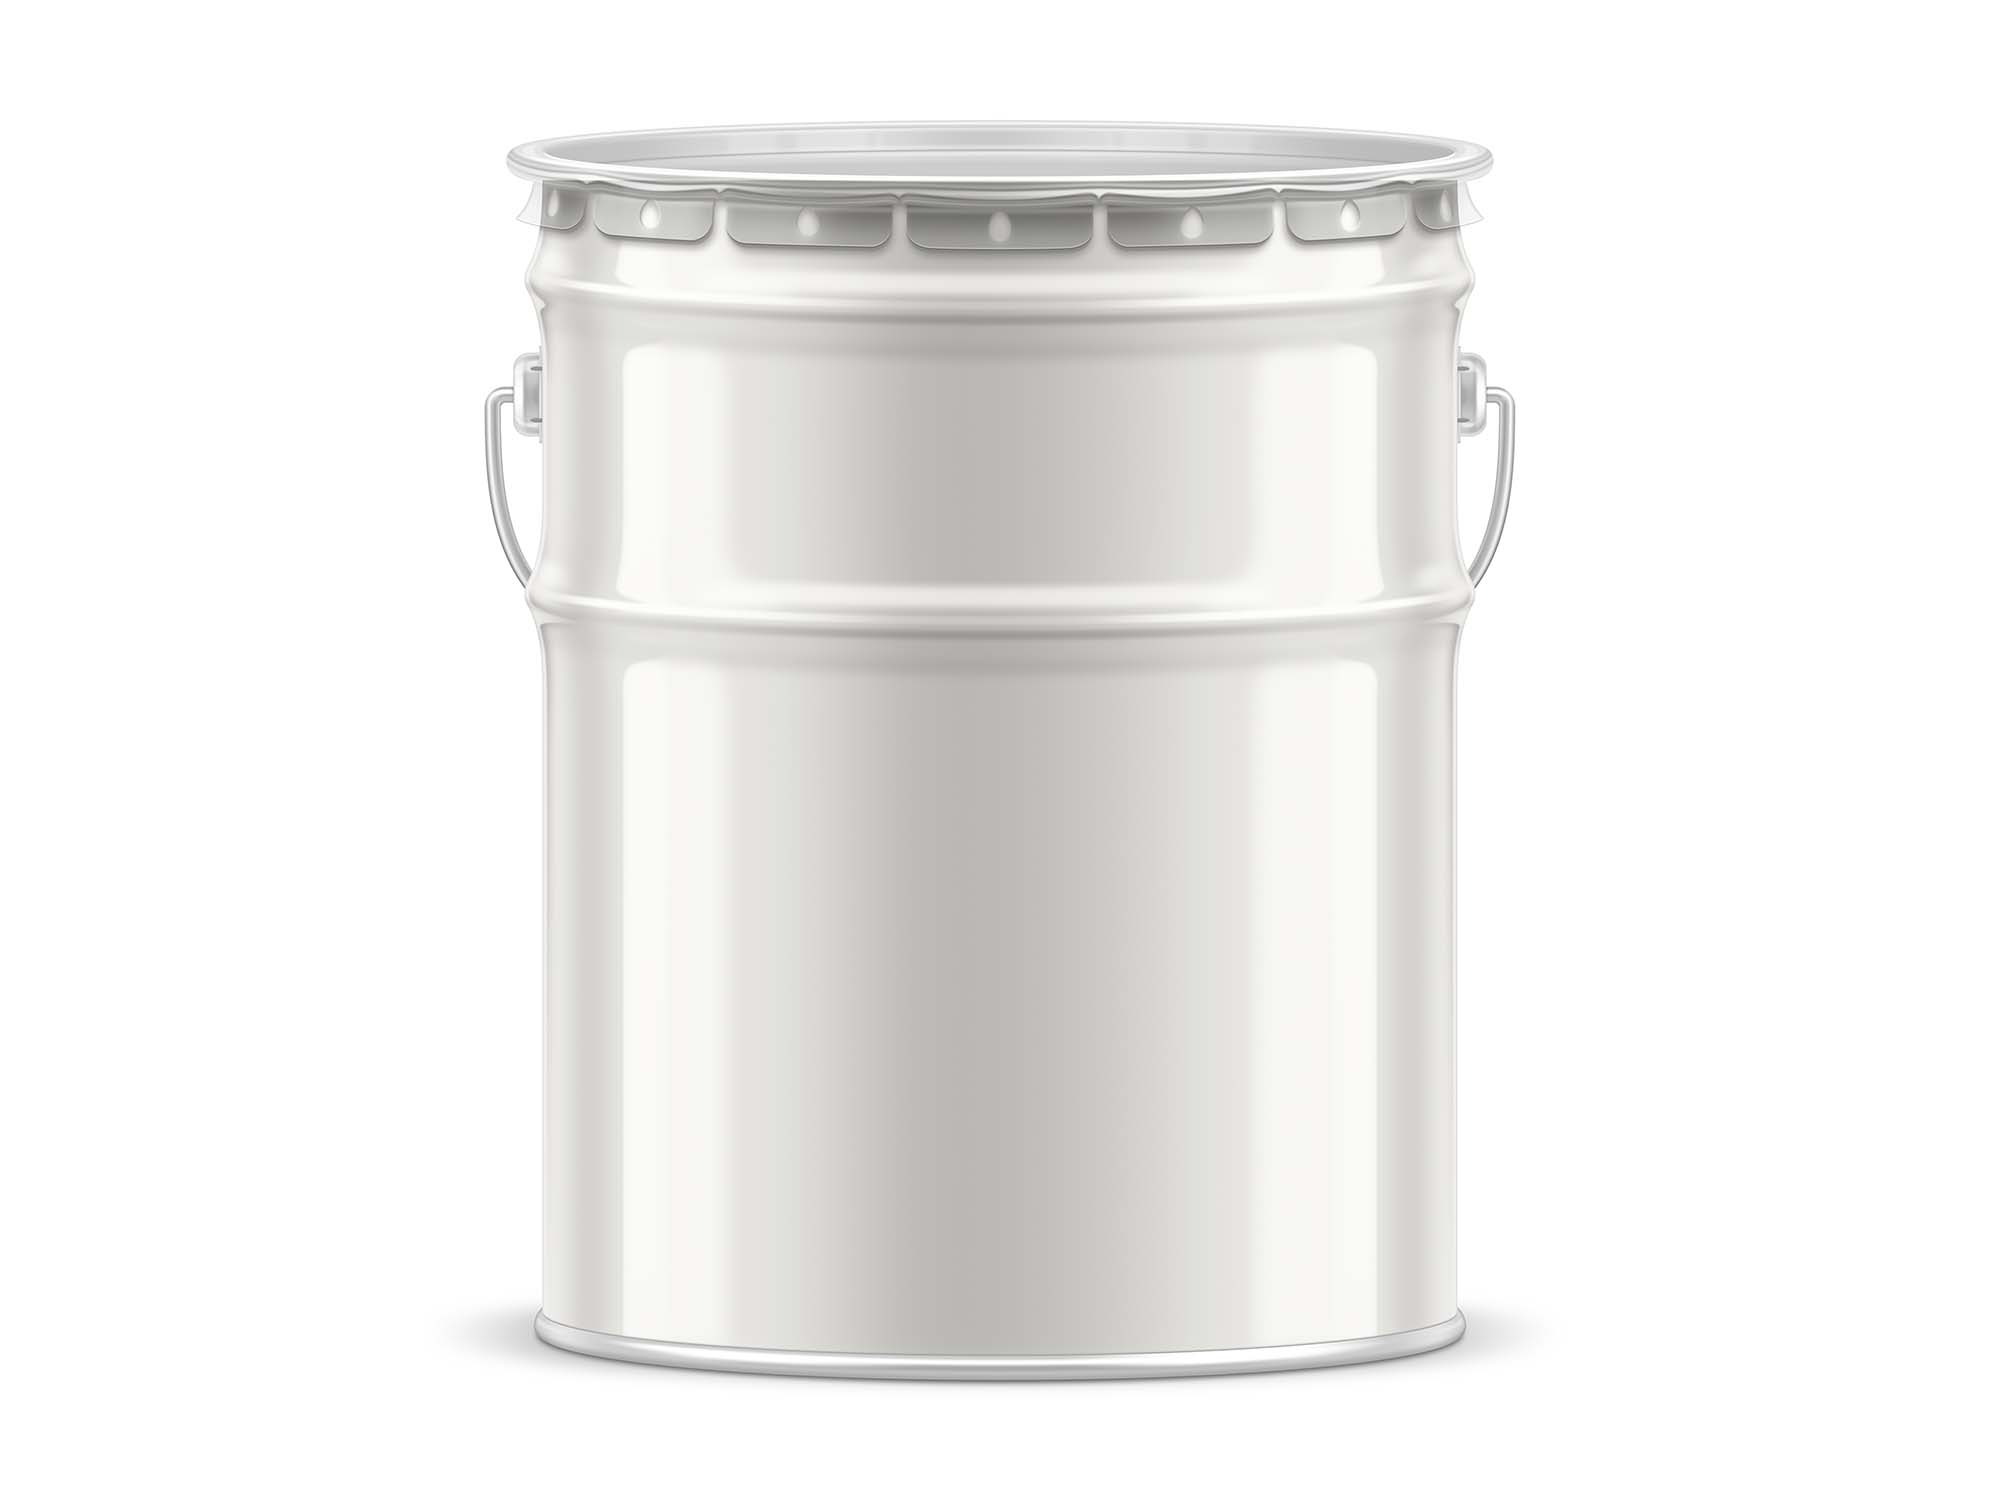 Tin Paint Bucket Mockup 2